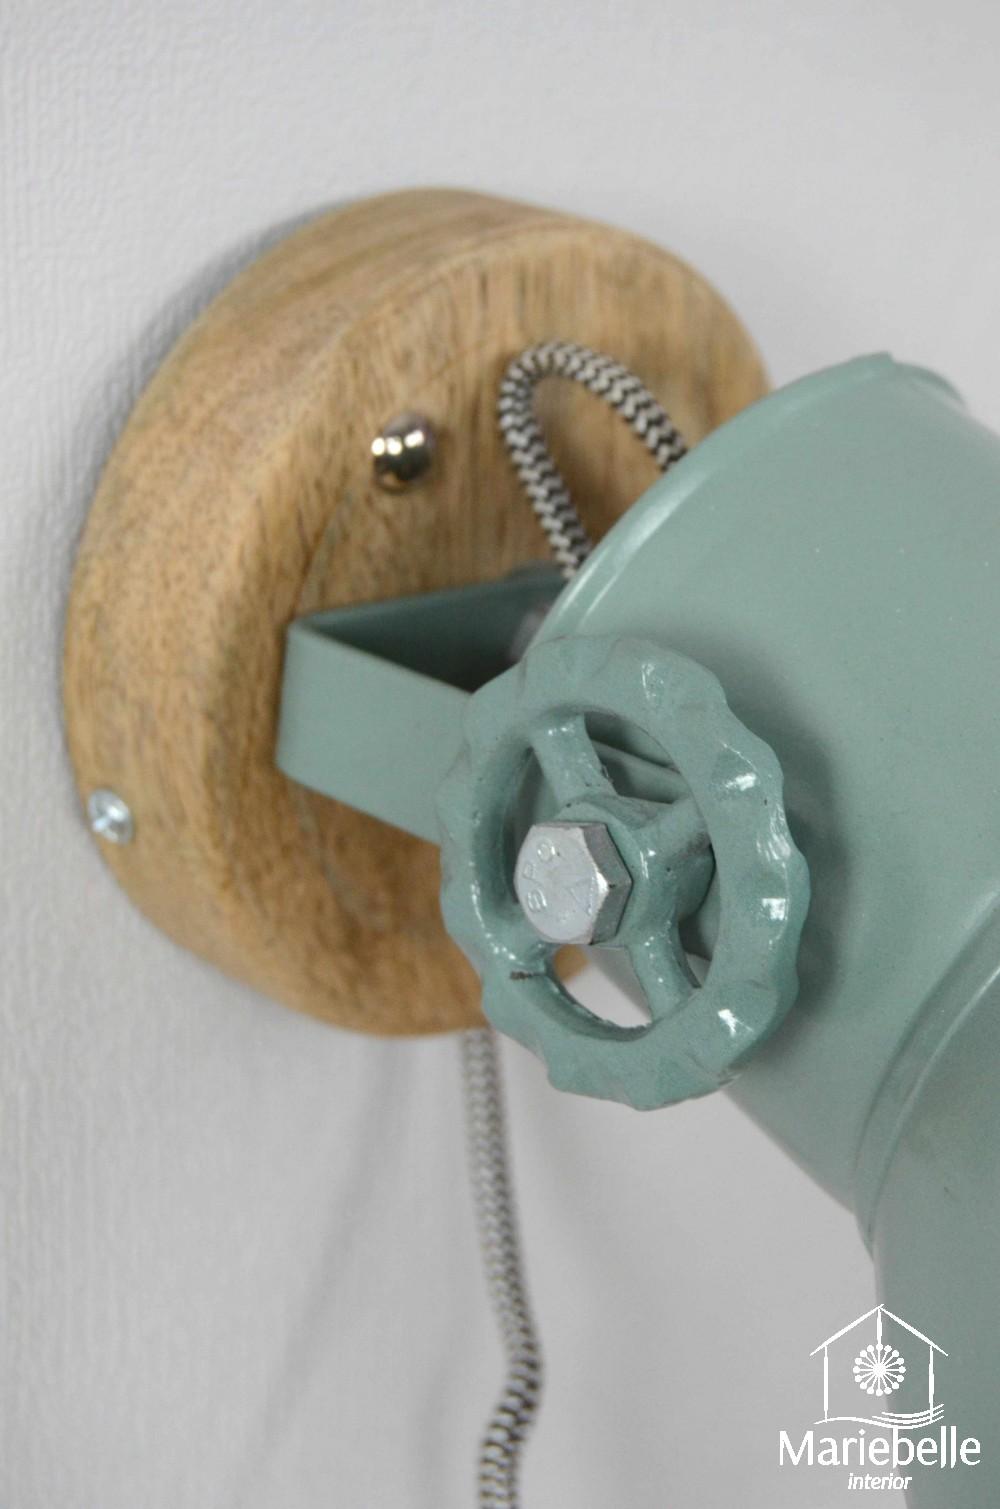 Wand industrielampe wandlampe leuchte lampe vintage shabby retro factory holz ebay - Wandlampe vintage retro ...